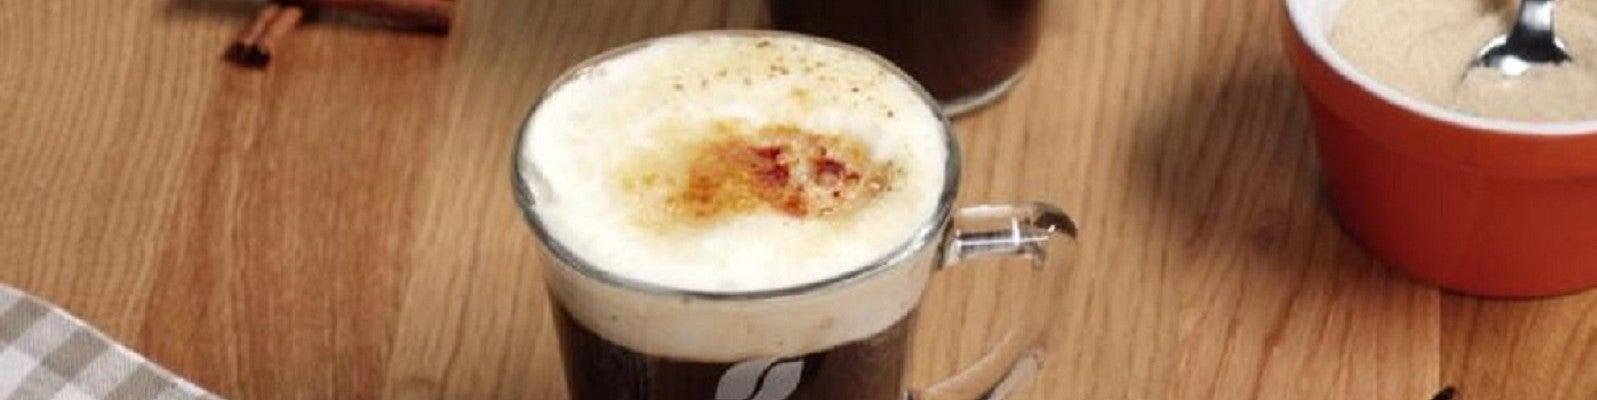 Café Crème Brûlée